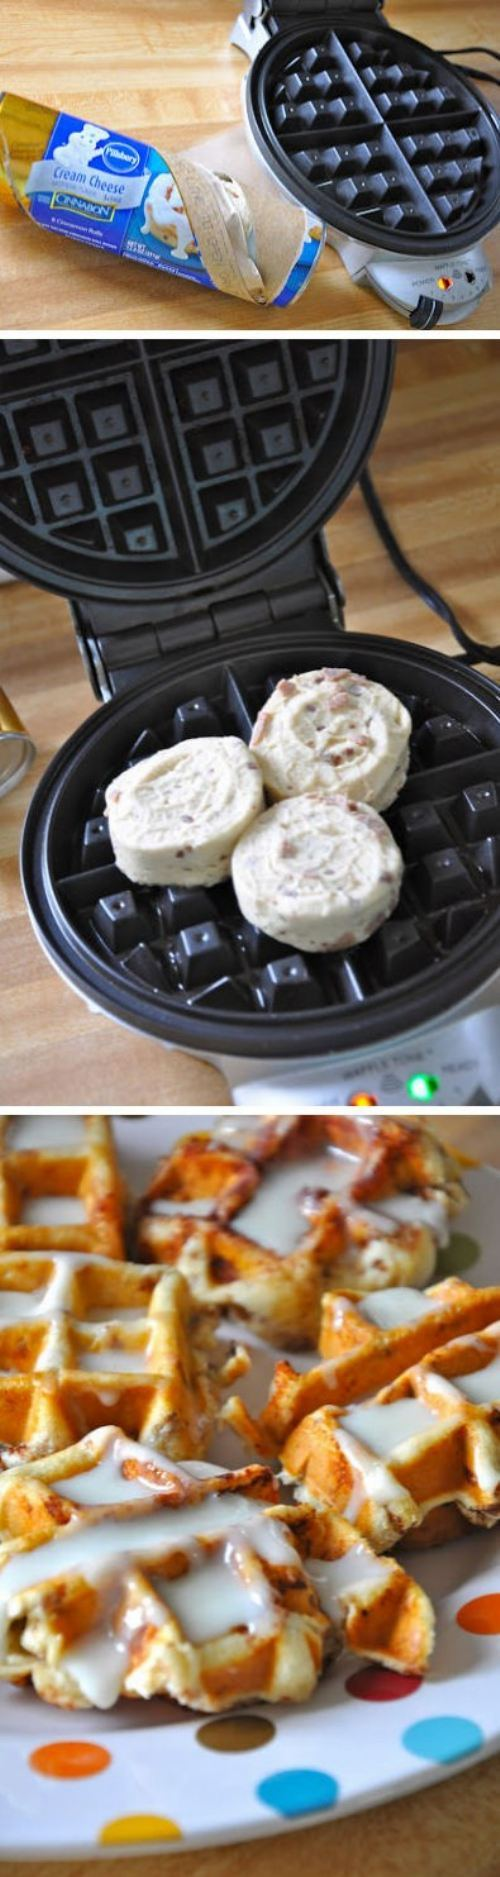 Cinnamon Roll Waffles?! Best idea ever! | Most Popular Pins